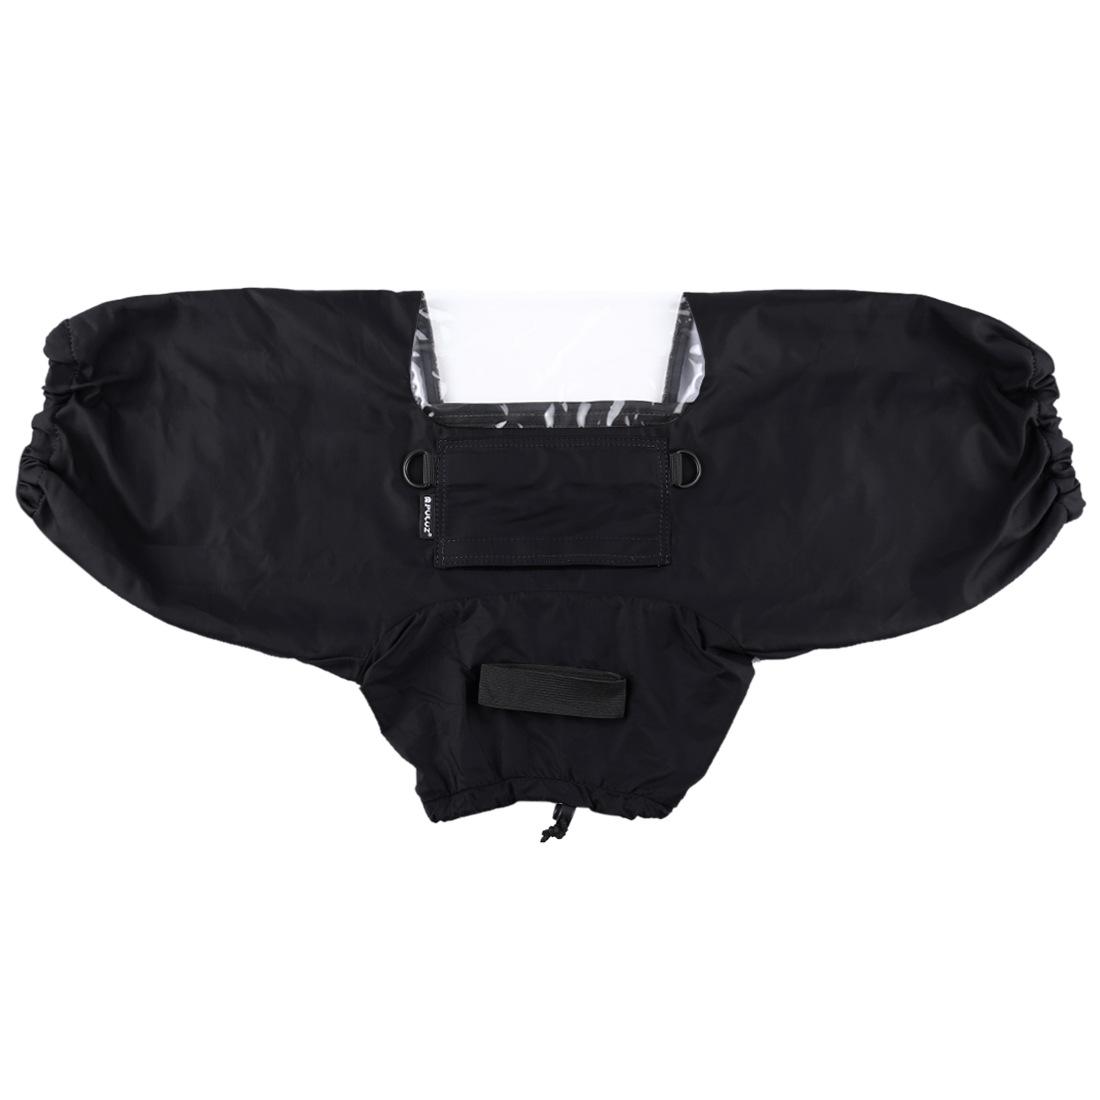 Professional Camera Rain Cover Coat Bag Protector Rainproof Against Dust Raincoat for Canon/Nikon/Song DSLR SLR Cameras black